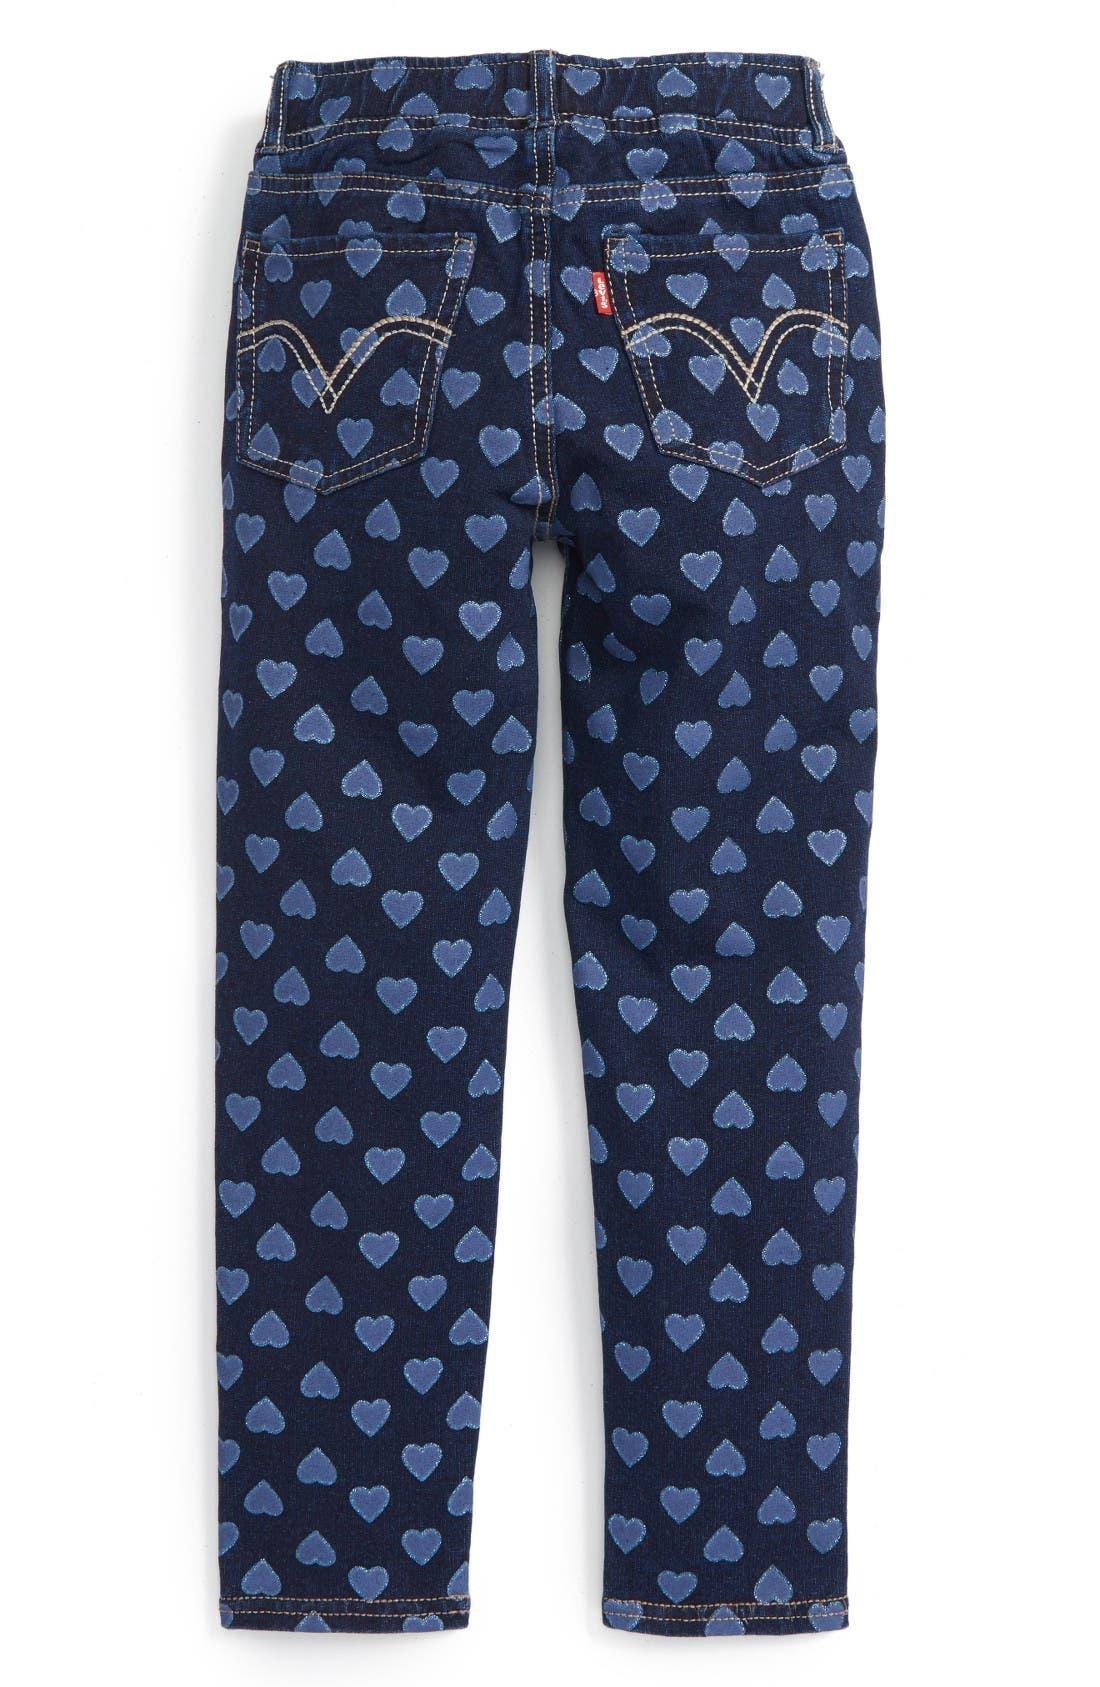 Haley May Leggings,                             Alternate thumbnail 2, color,                             Baltic Blue